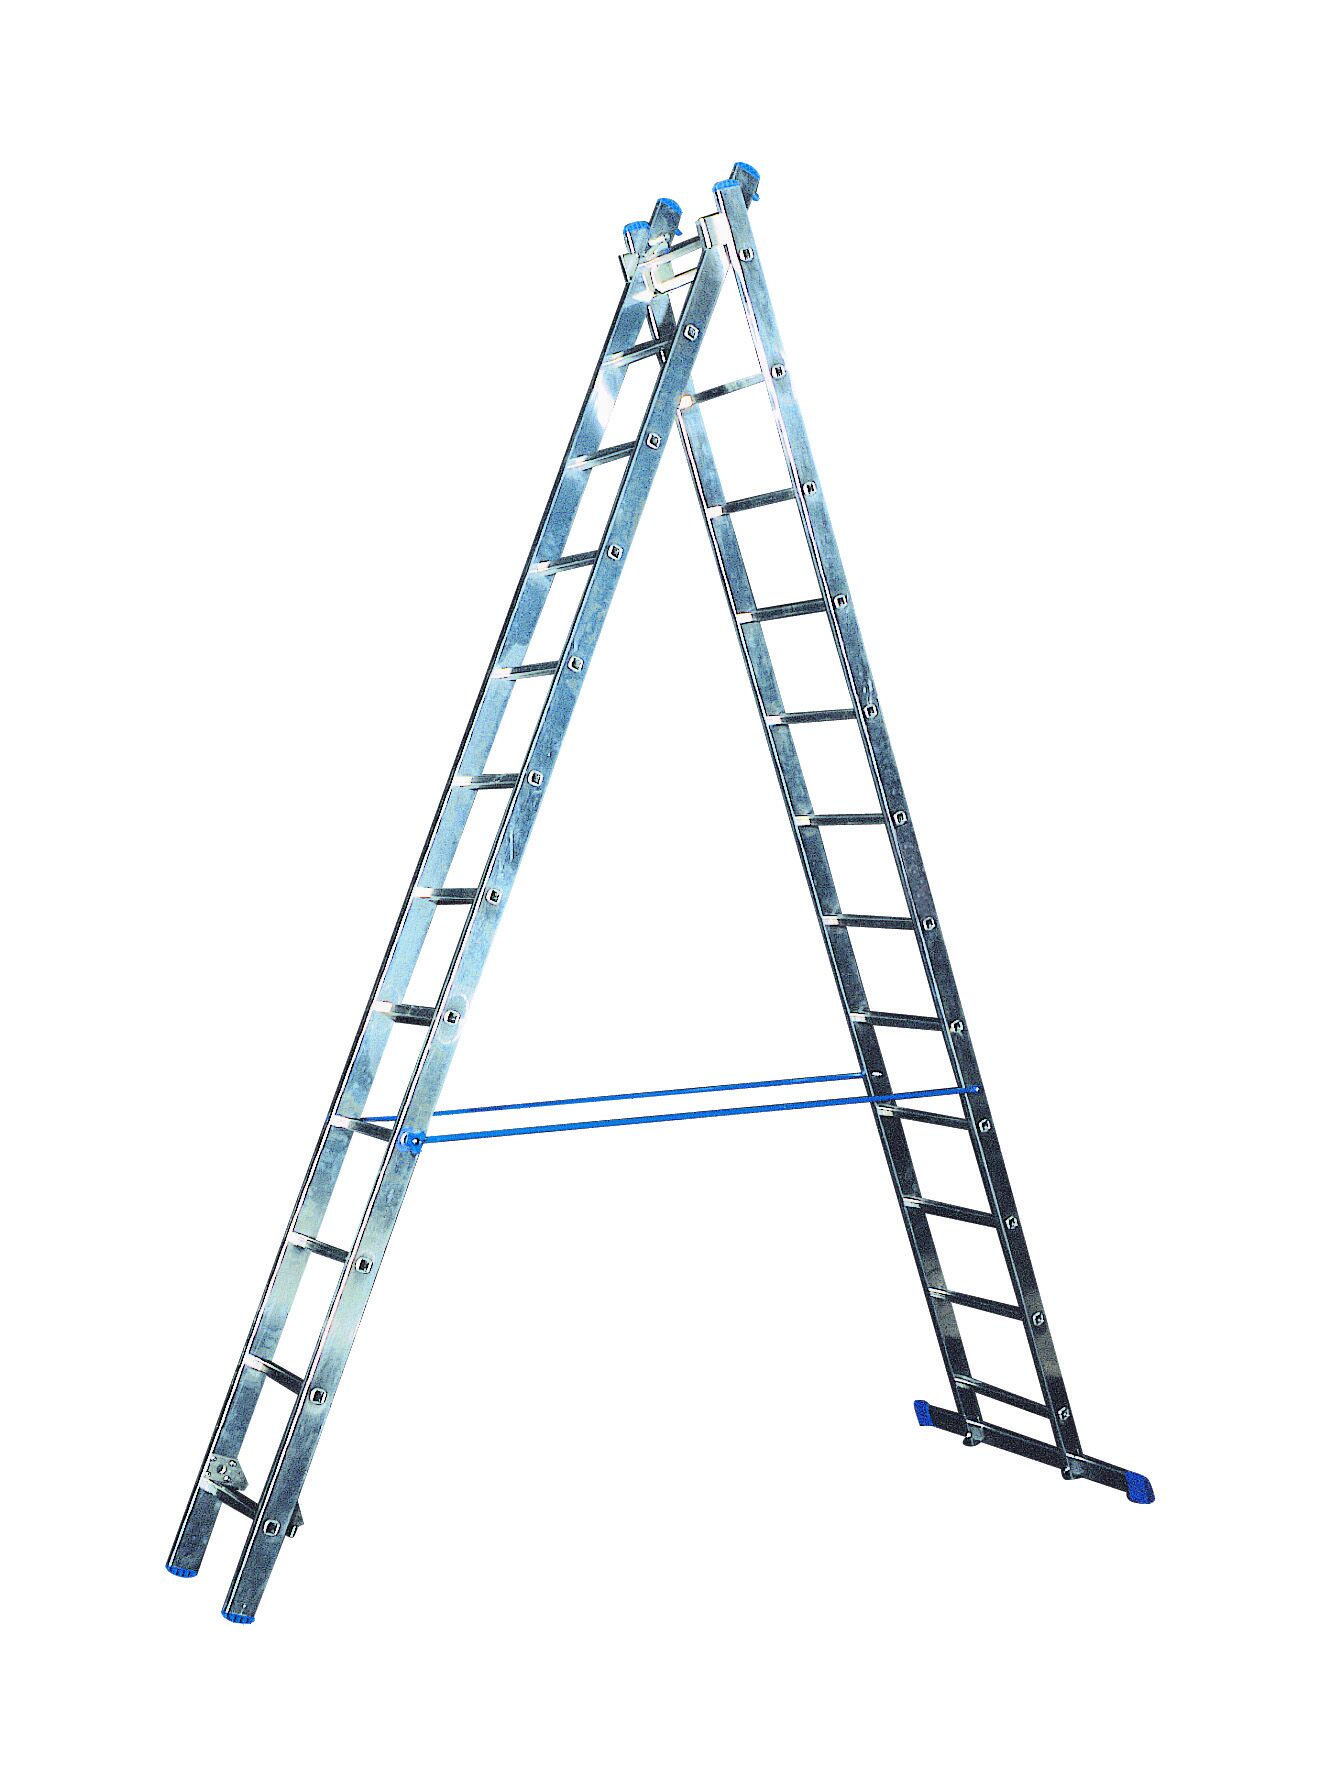 Žebřík hliníkový víceučelový HOBBY VHR H 2x13 Al